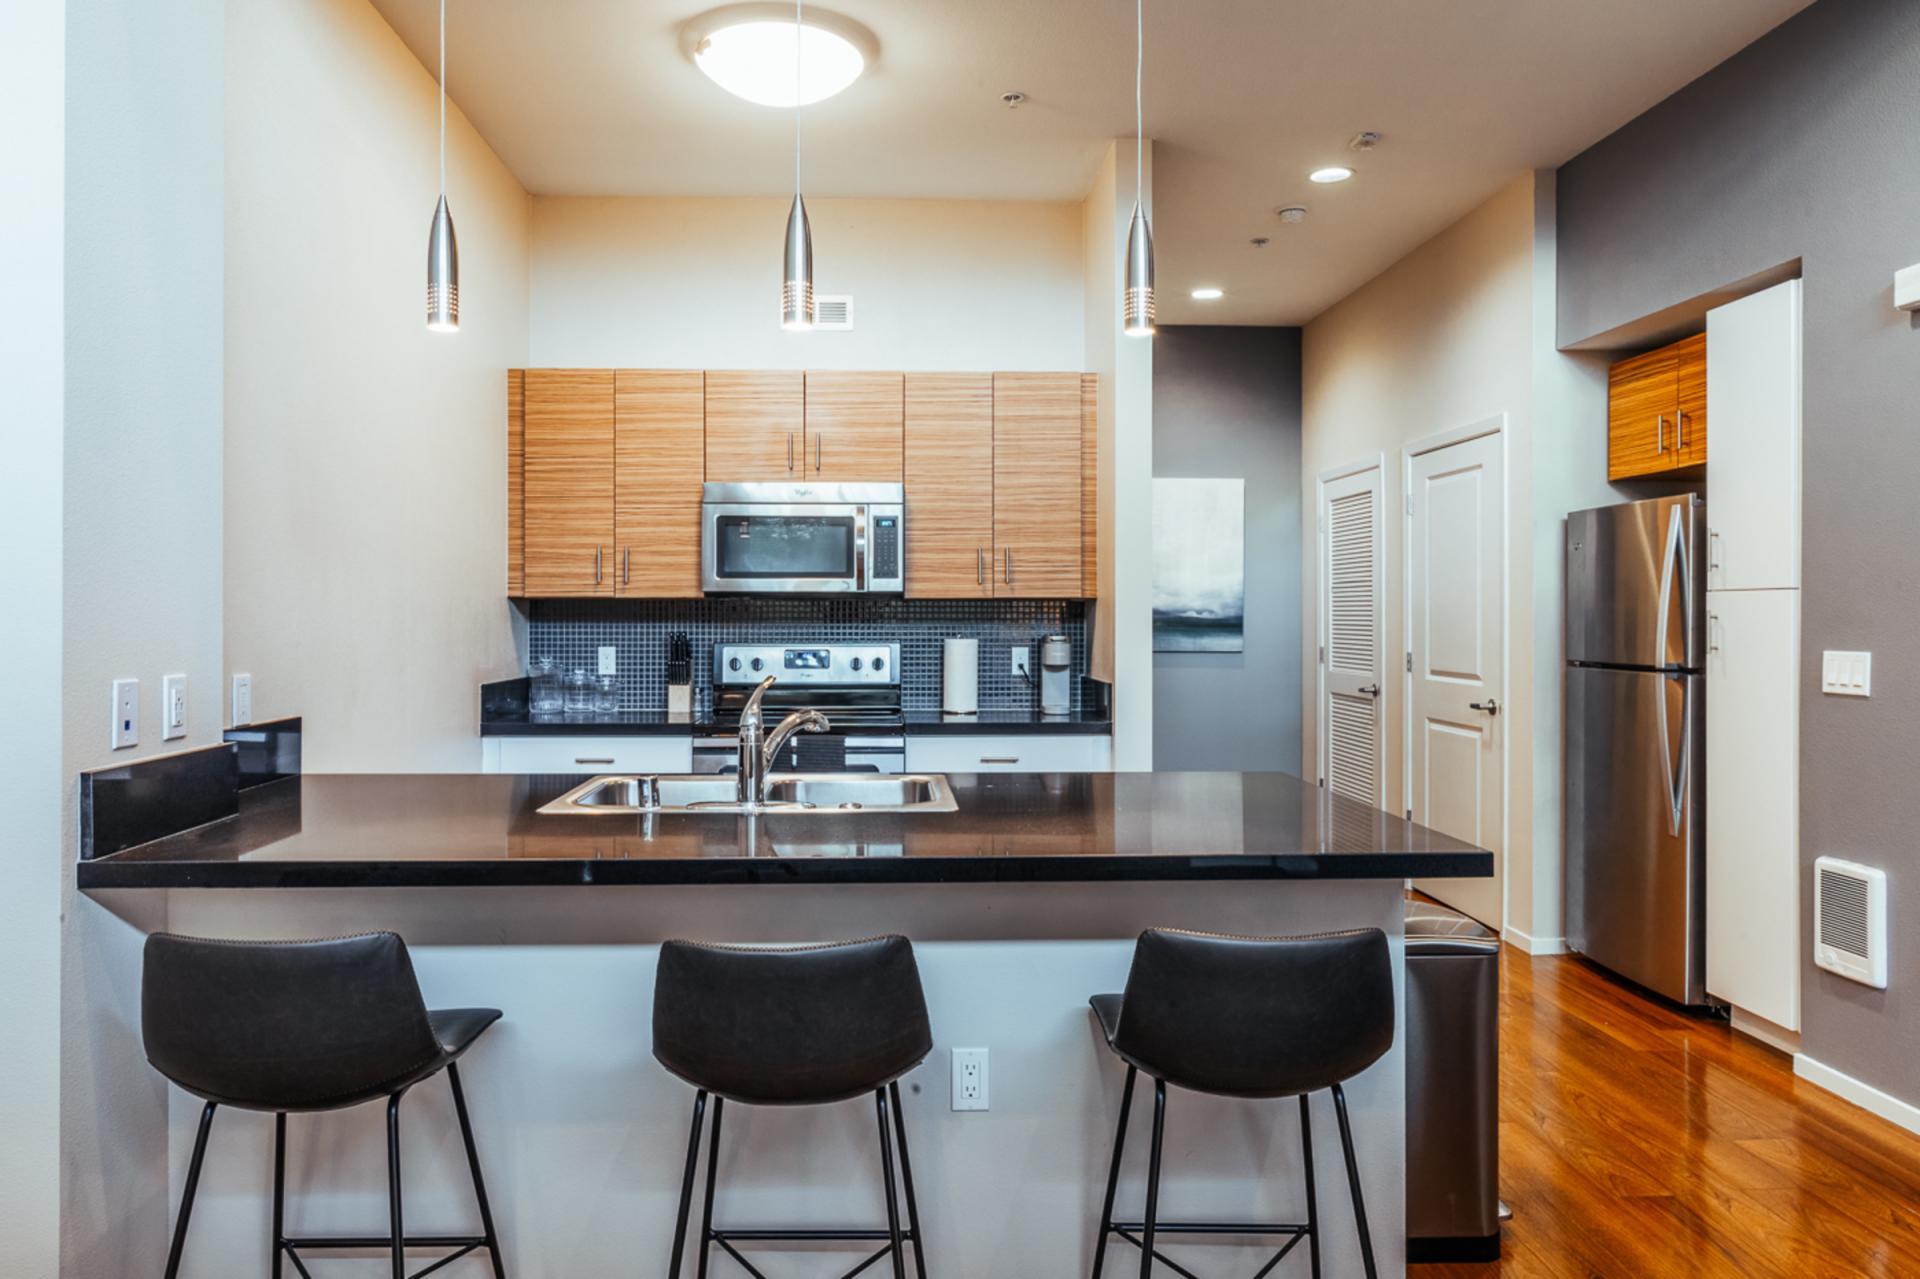 Kitchen at Landing Furnished Apartments at MB360, Mission Bay, San Francisco